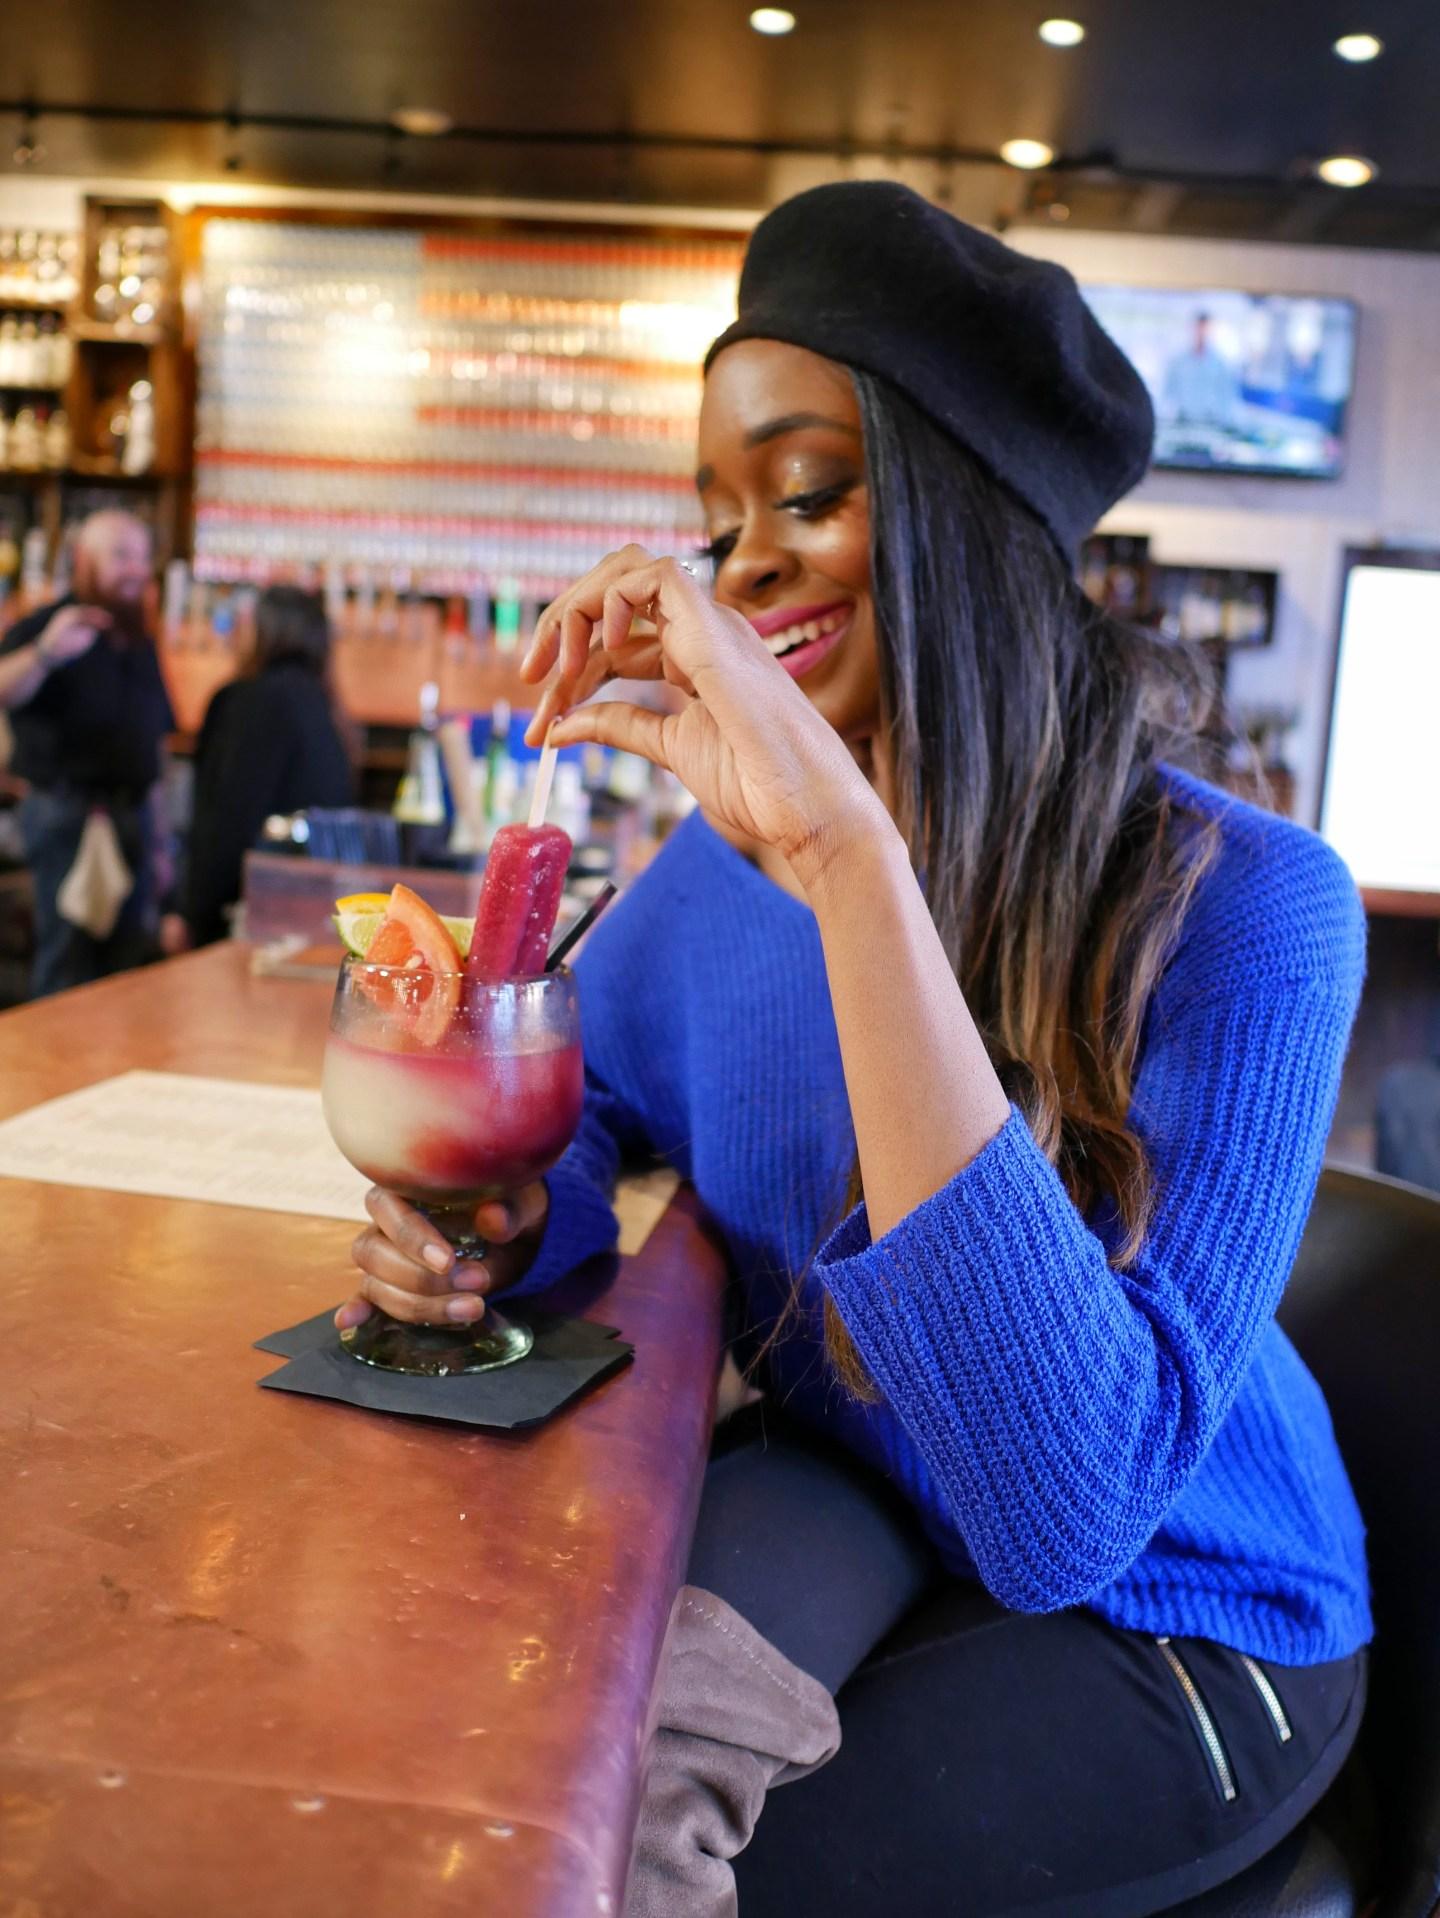 Margarita Mile Visit Dallas Dallas Travel Guide: The Coolest City You Should Visit